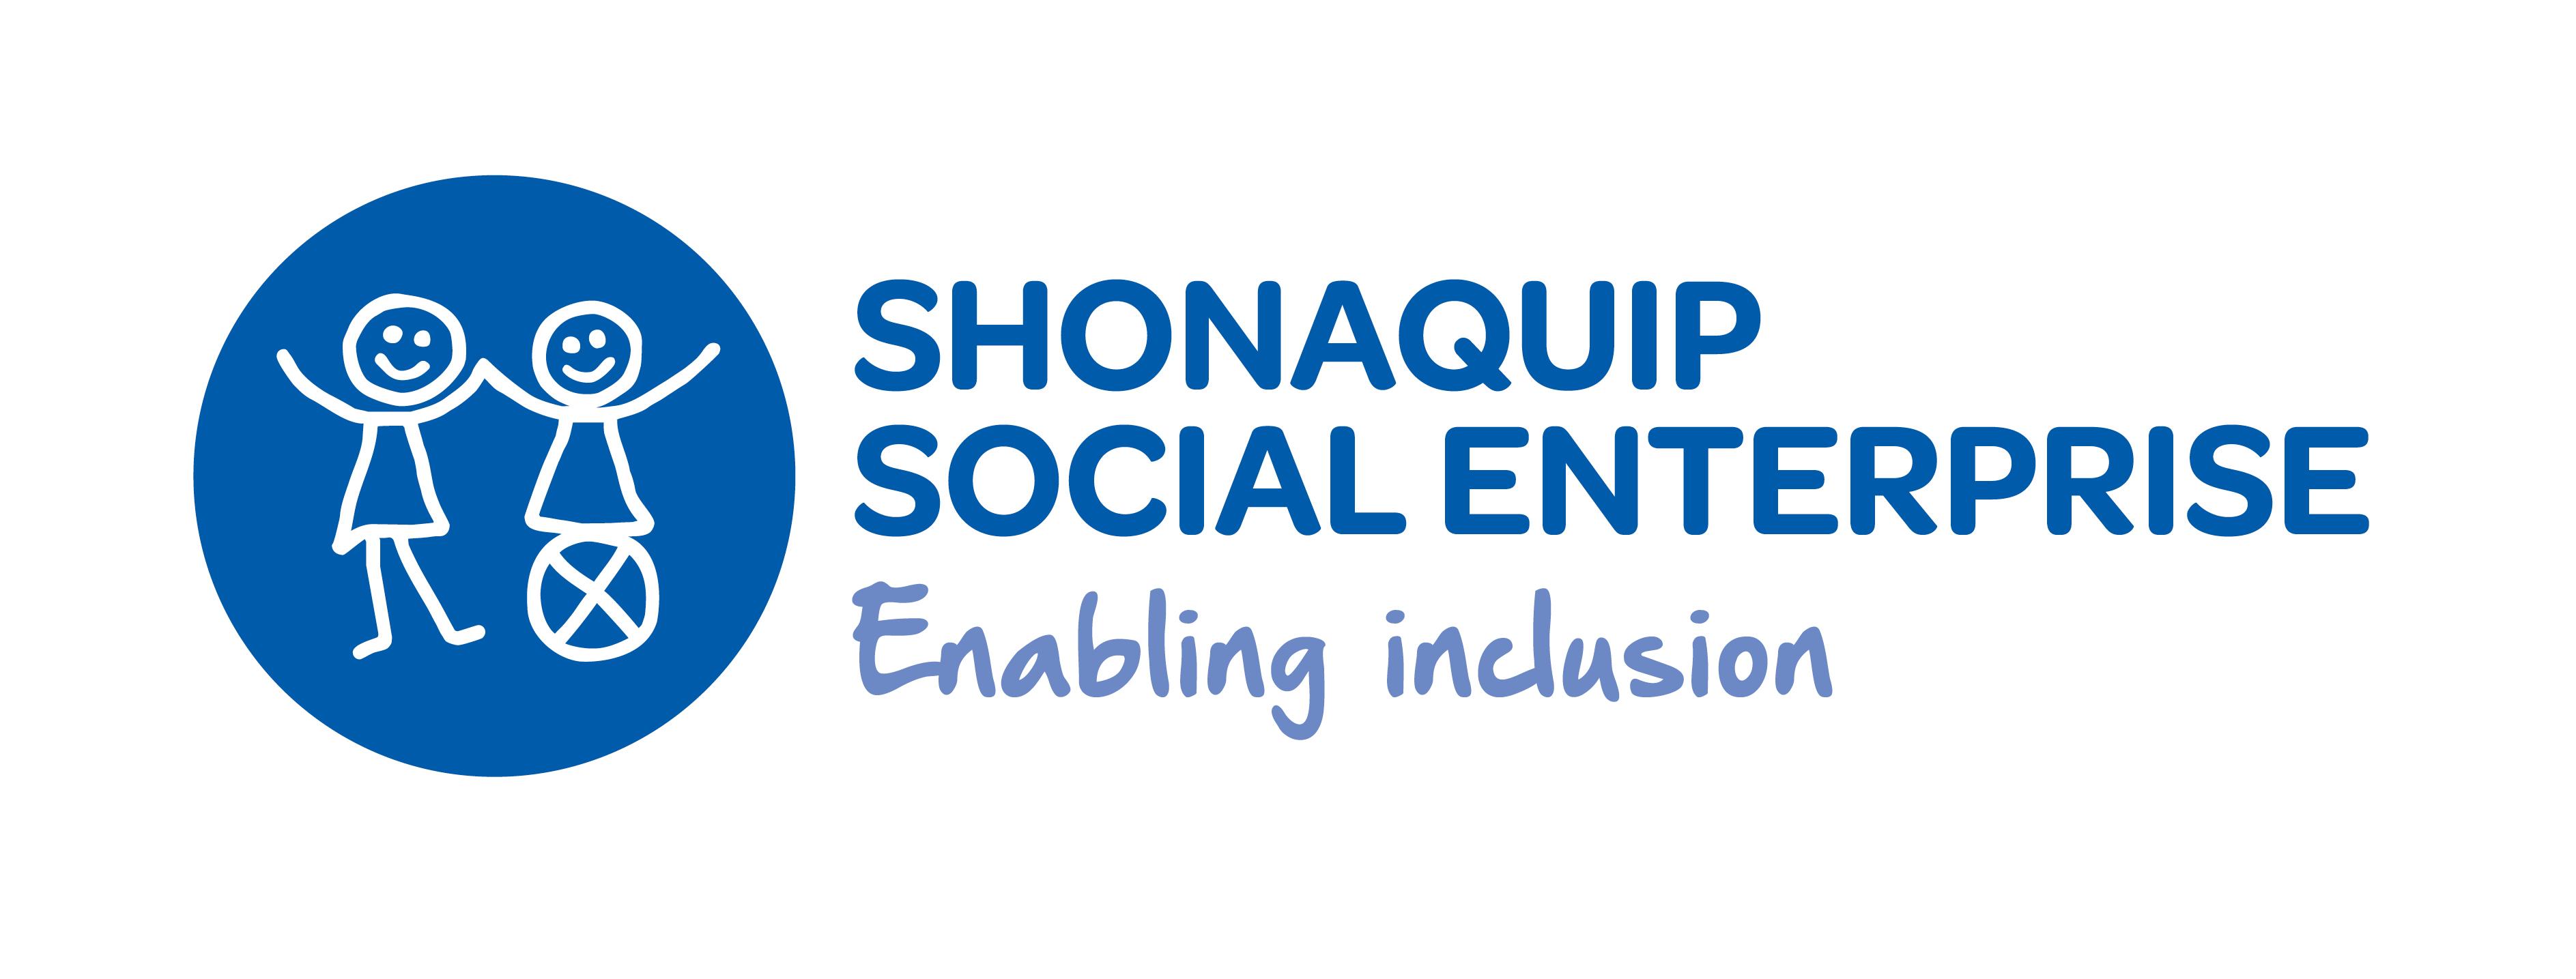 Shonaquip Social Enterprise